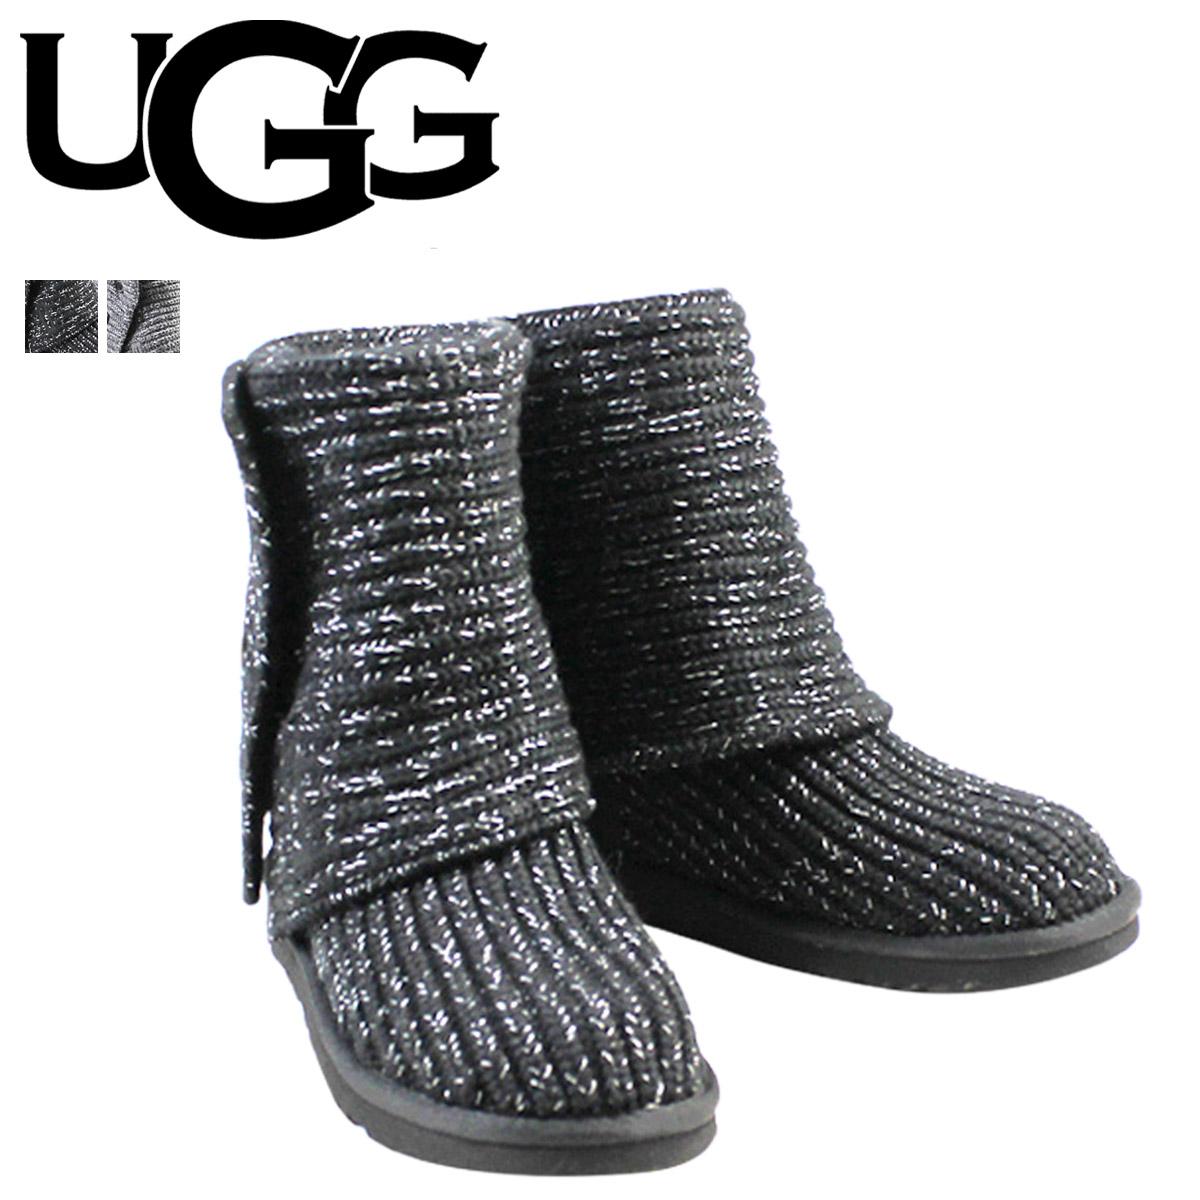 57eda6b268c UGG UGG lattice CARDI boots WOMENS LATTICE CARDY 1876 Sheepskin knit ladies